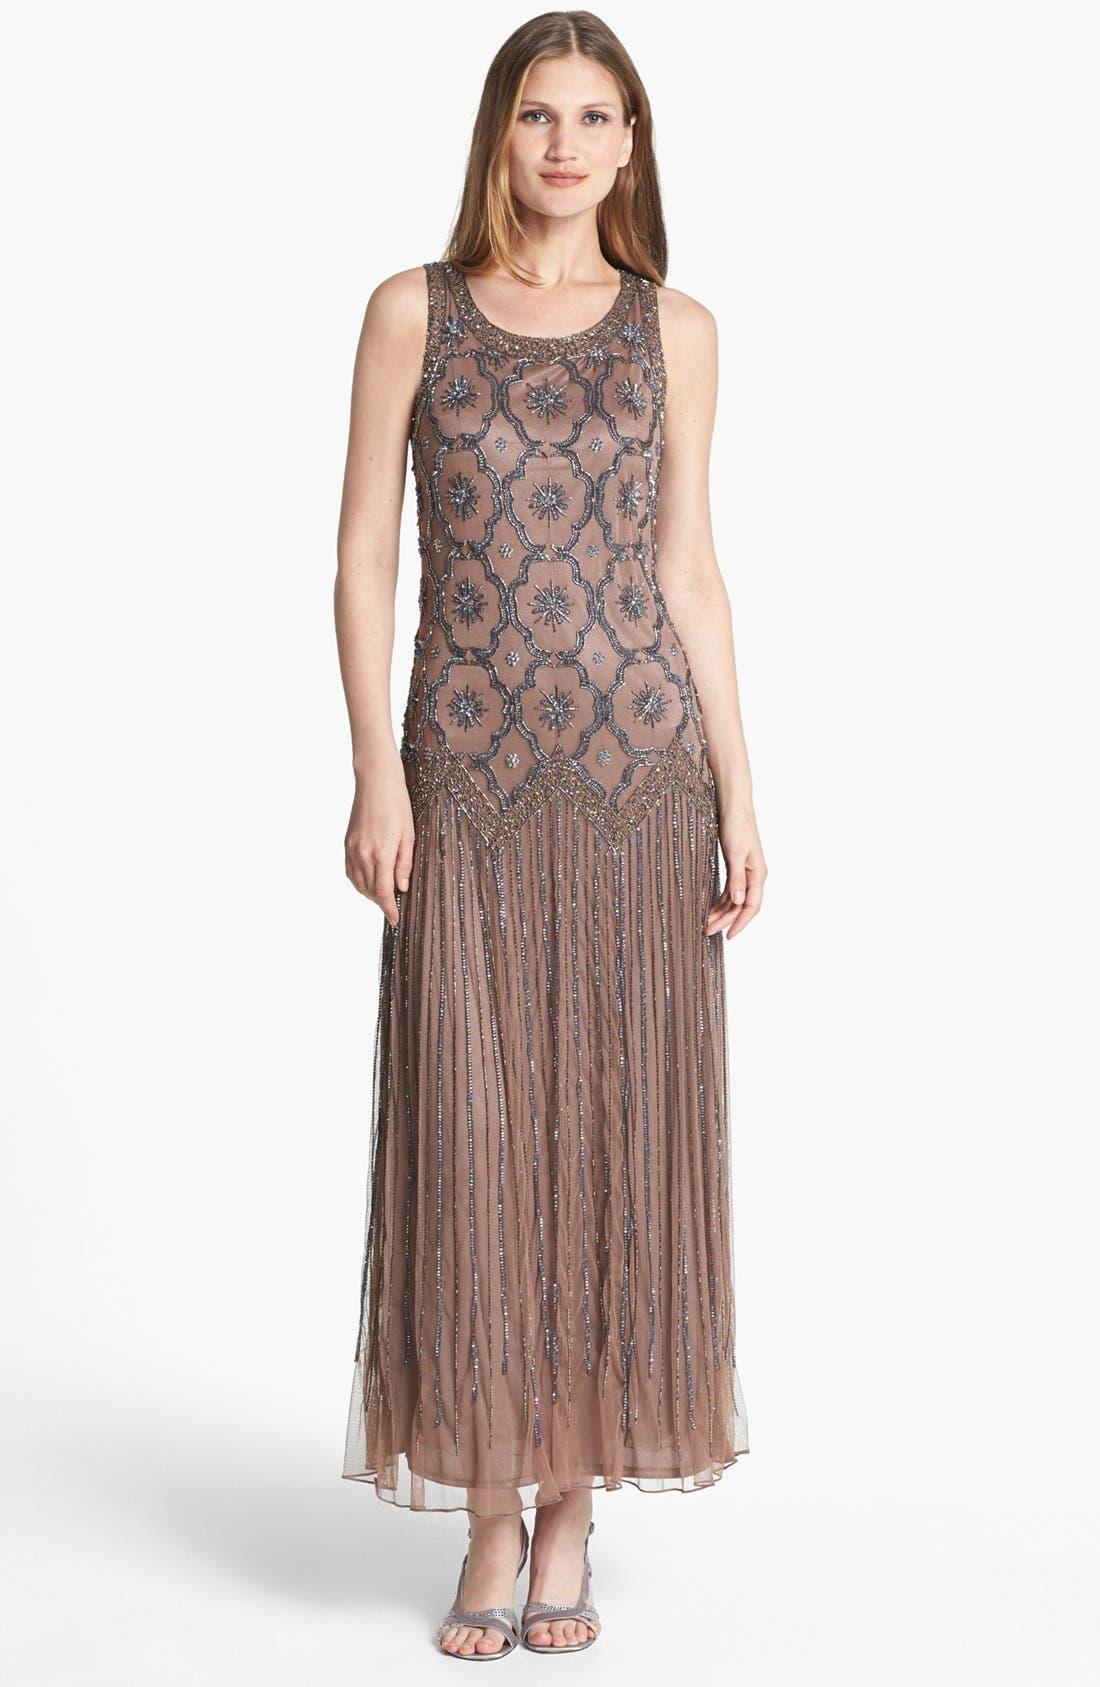 Main Image - Pisarro Nights Embellished Drop Waist Midi Dress